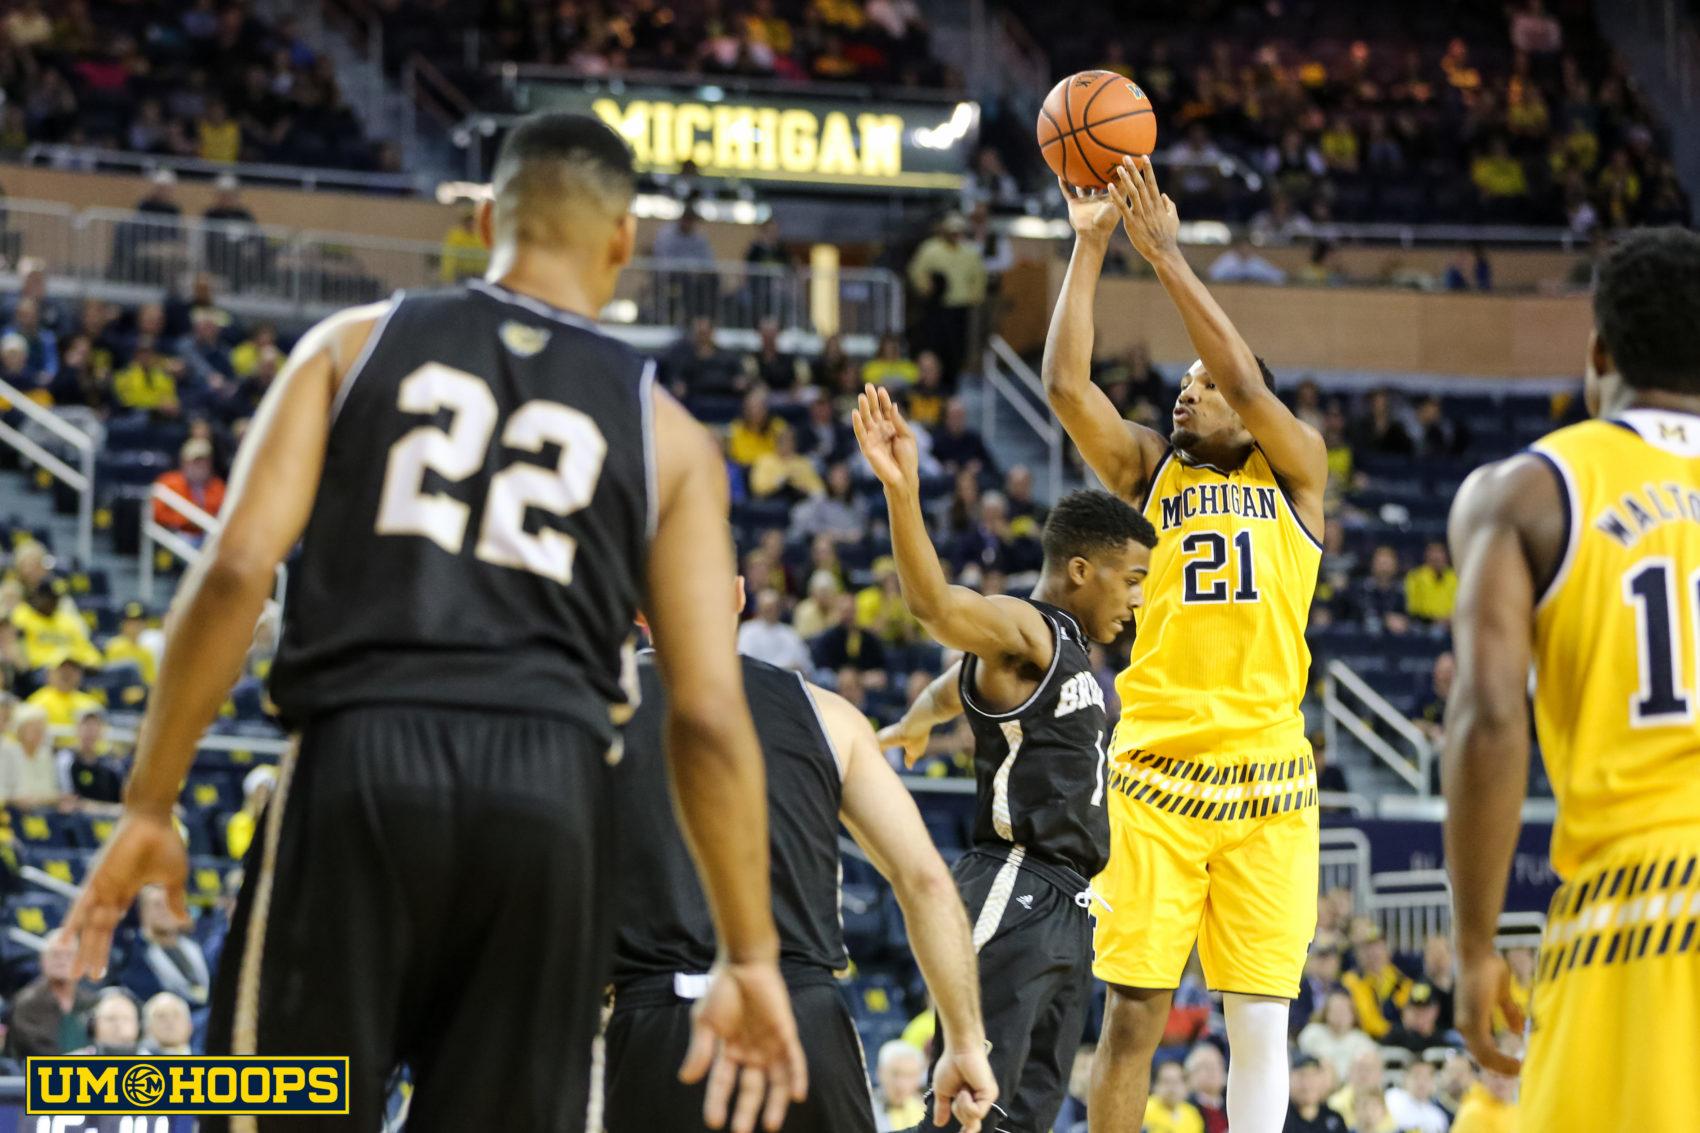 Michigan 96, Bryant 60-3